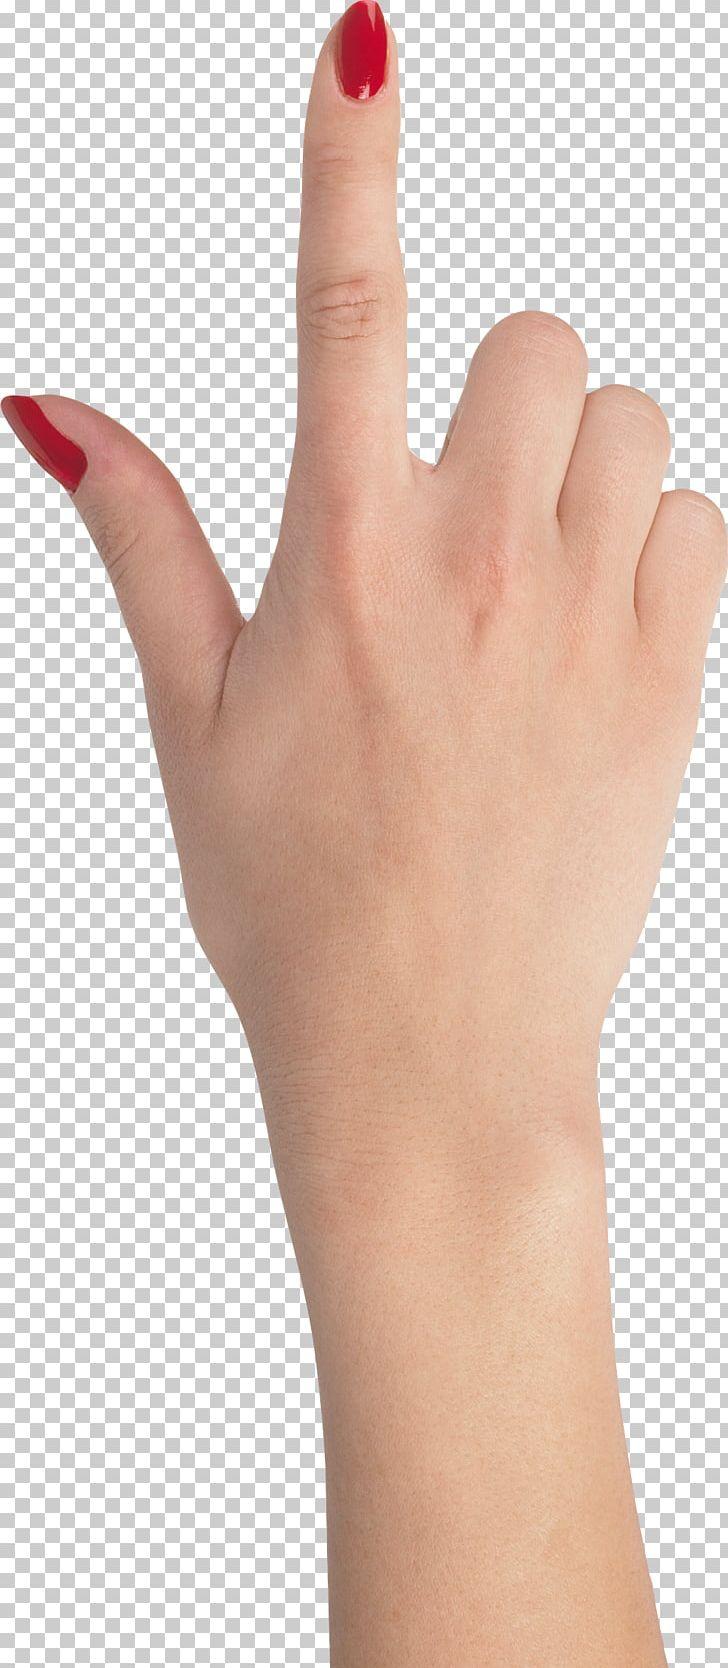 Finger Hand PNG, Clipart, Arm, Clip Art, Digit, Finger, Fingers Free PNG Download